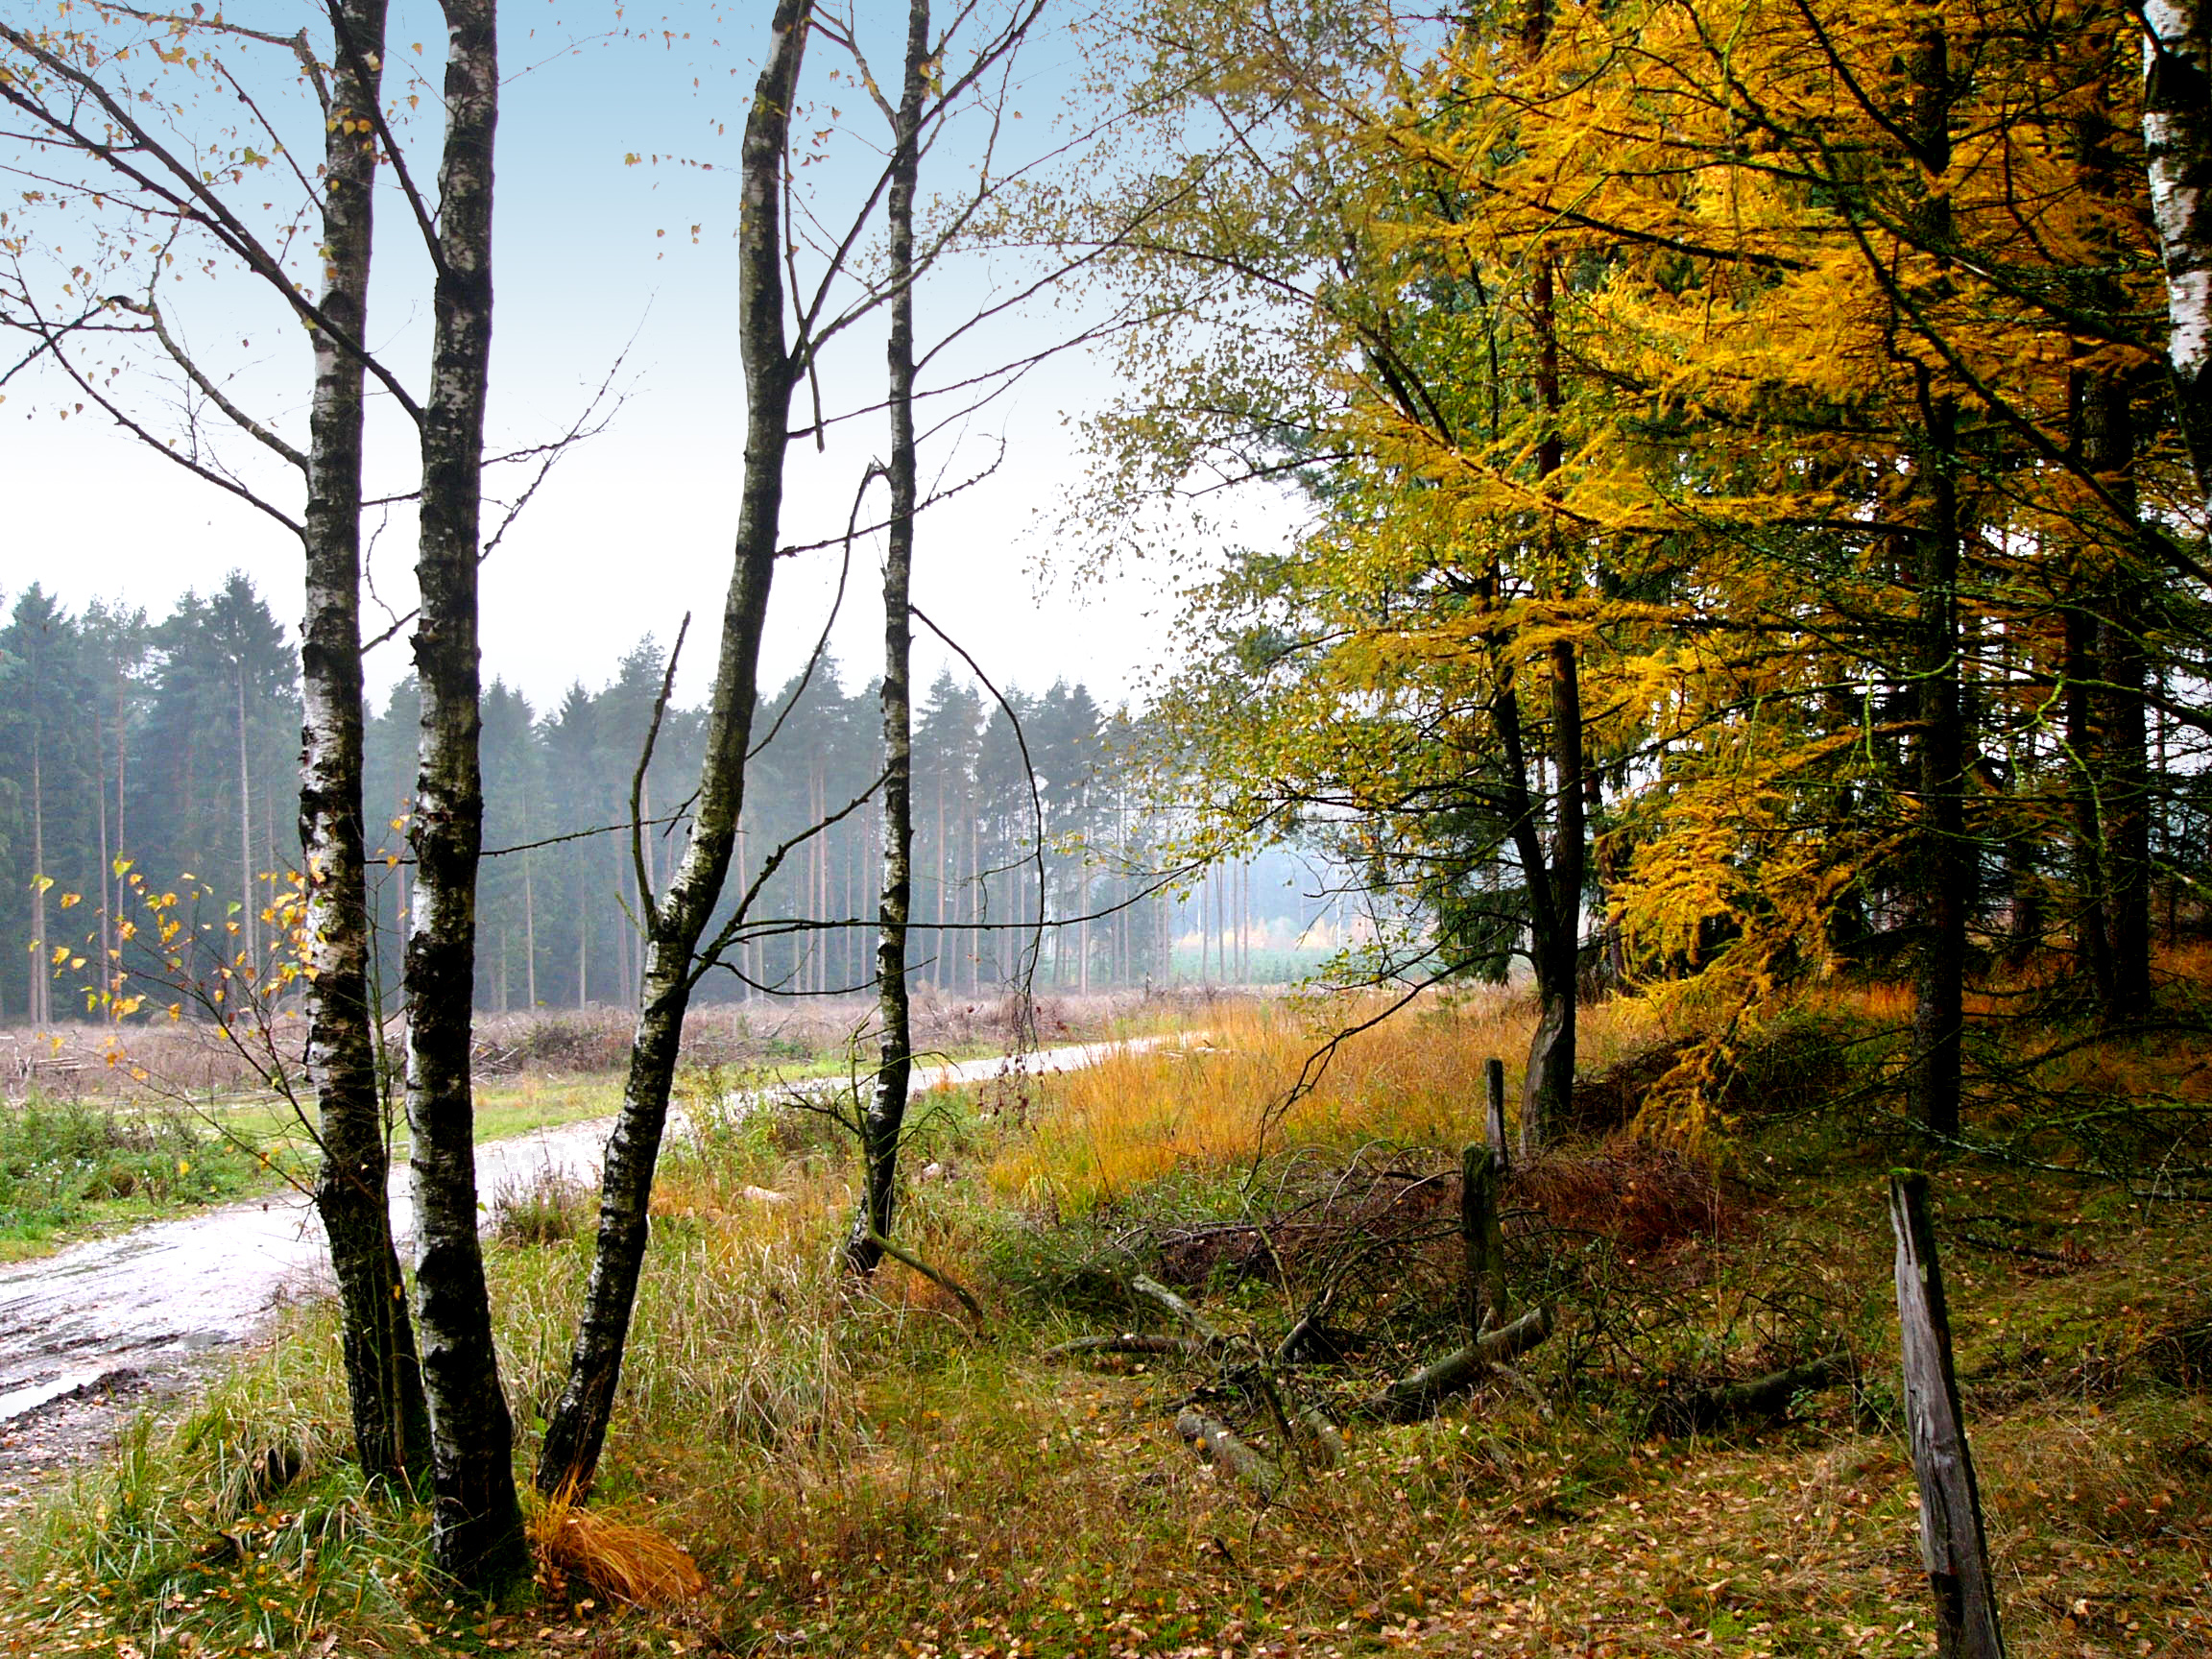 FileHerbst im Teutoburger Wald 01jpg  Wikimedia Commons